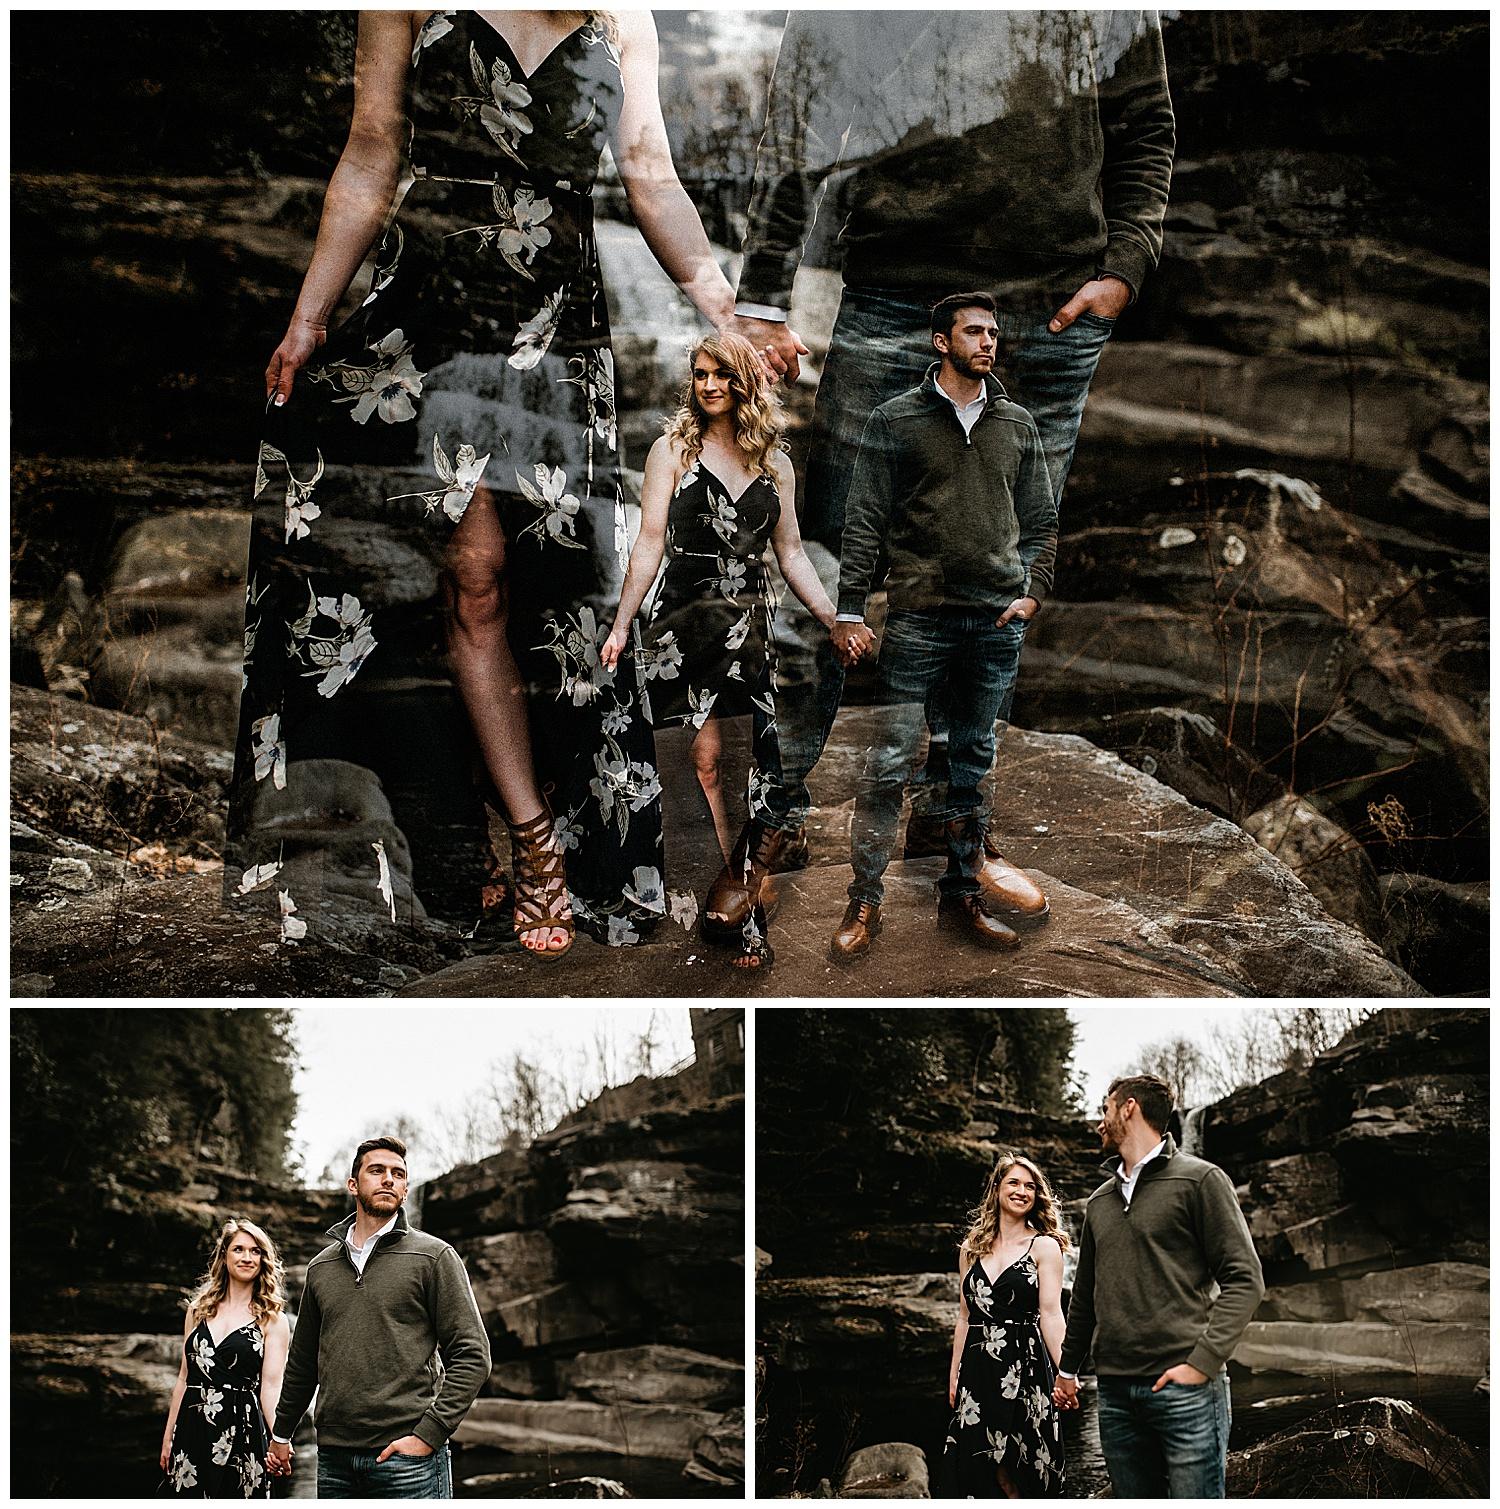 NEPA-Lehigh-Valley-Wedding-Photographer-Ledges-Hotel-Hawley-PA_0014.jpg